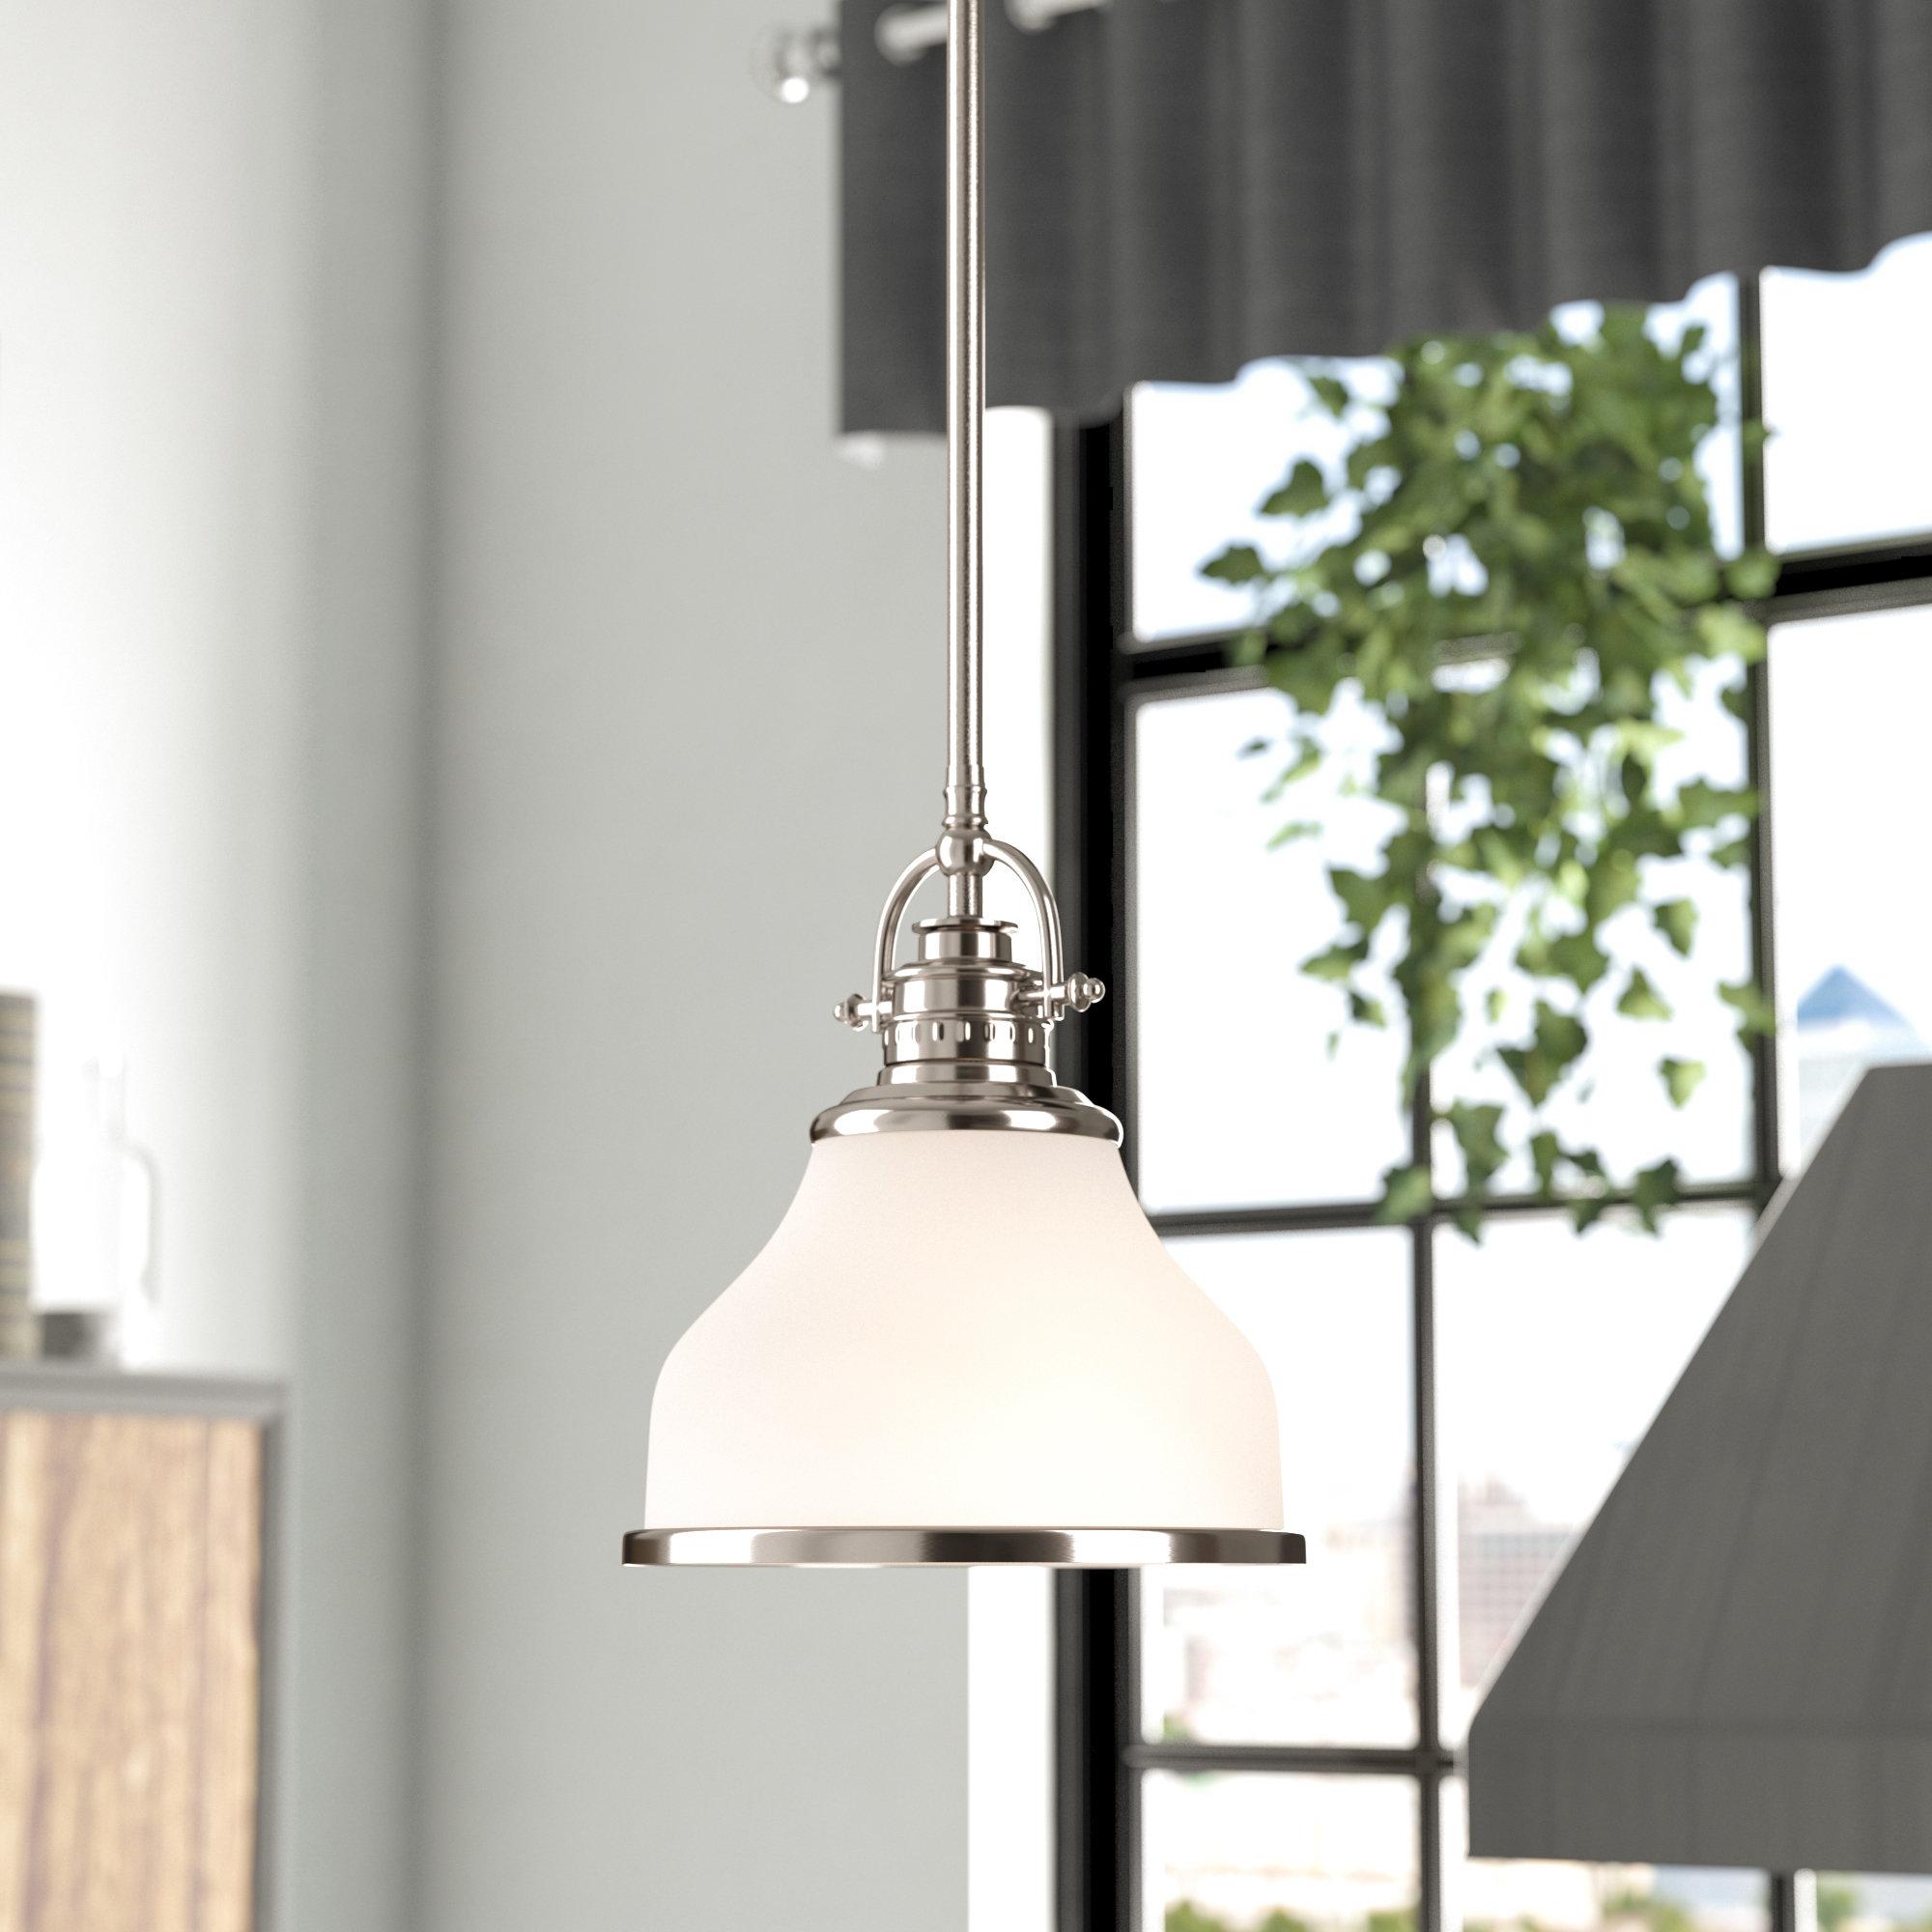 Dome Mini Pendants You'll Love | Wayfair.ca inside Abernathy 1-Light Dome Pendants (Image 16 of 30)